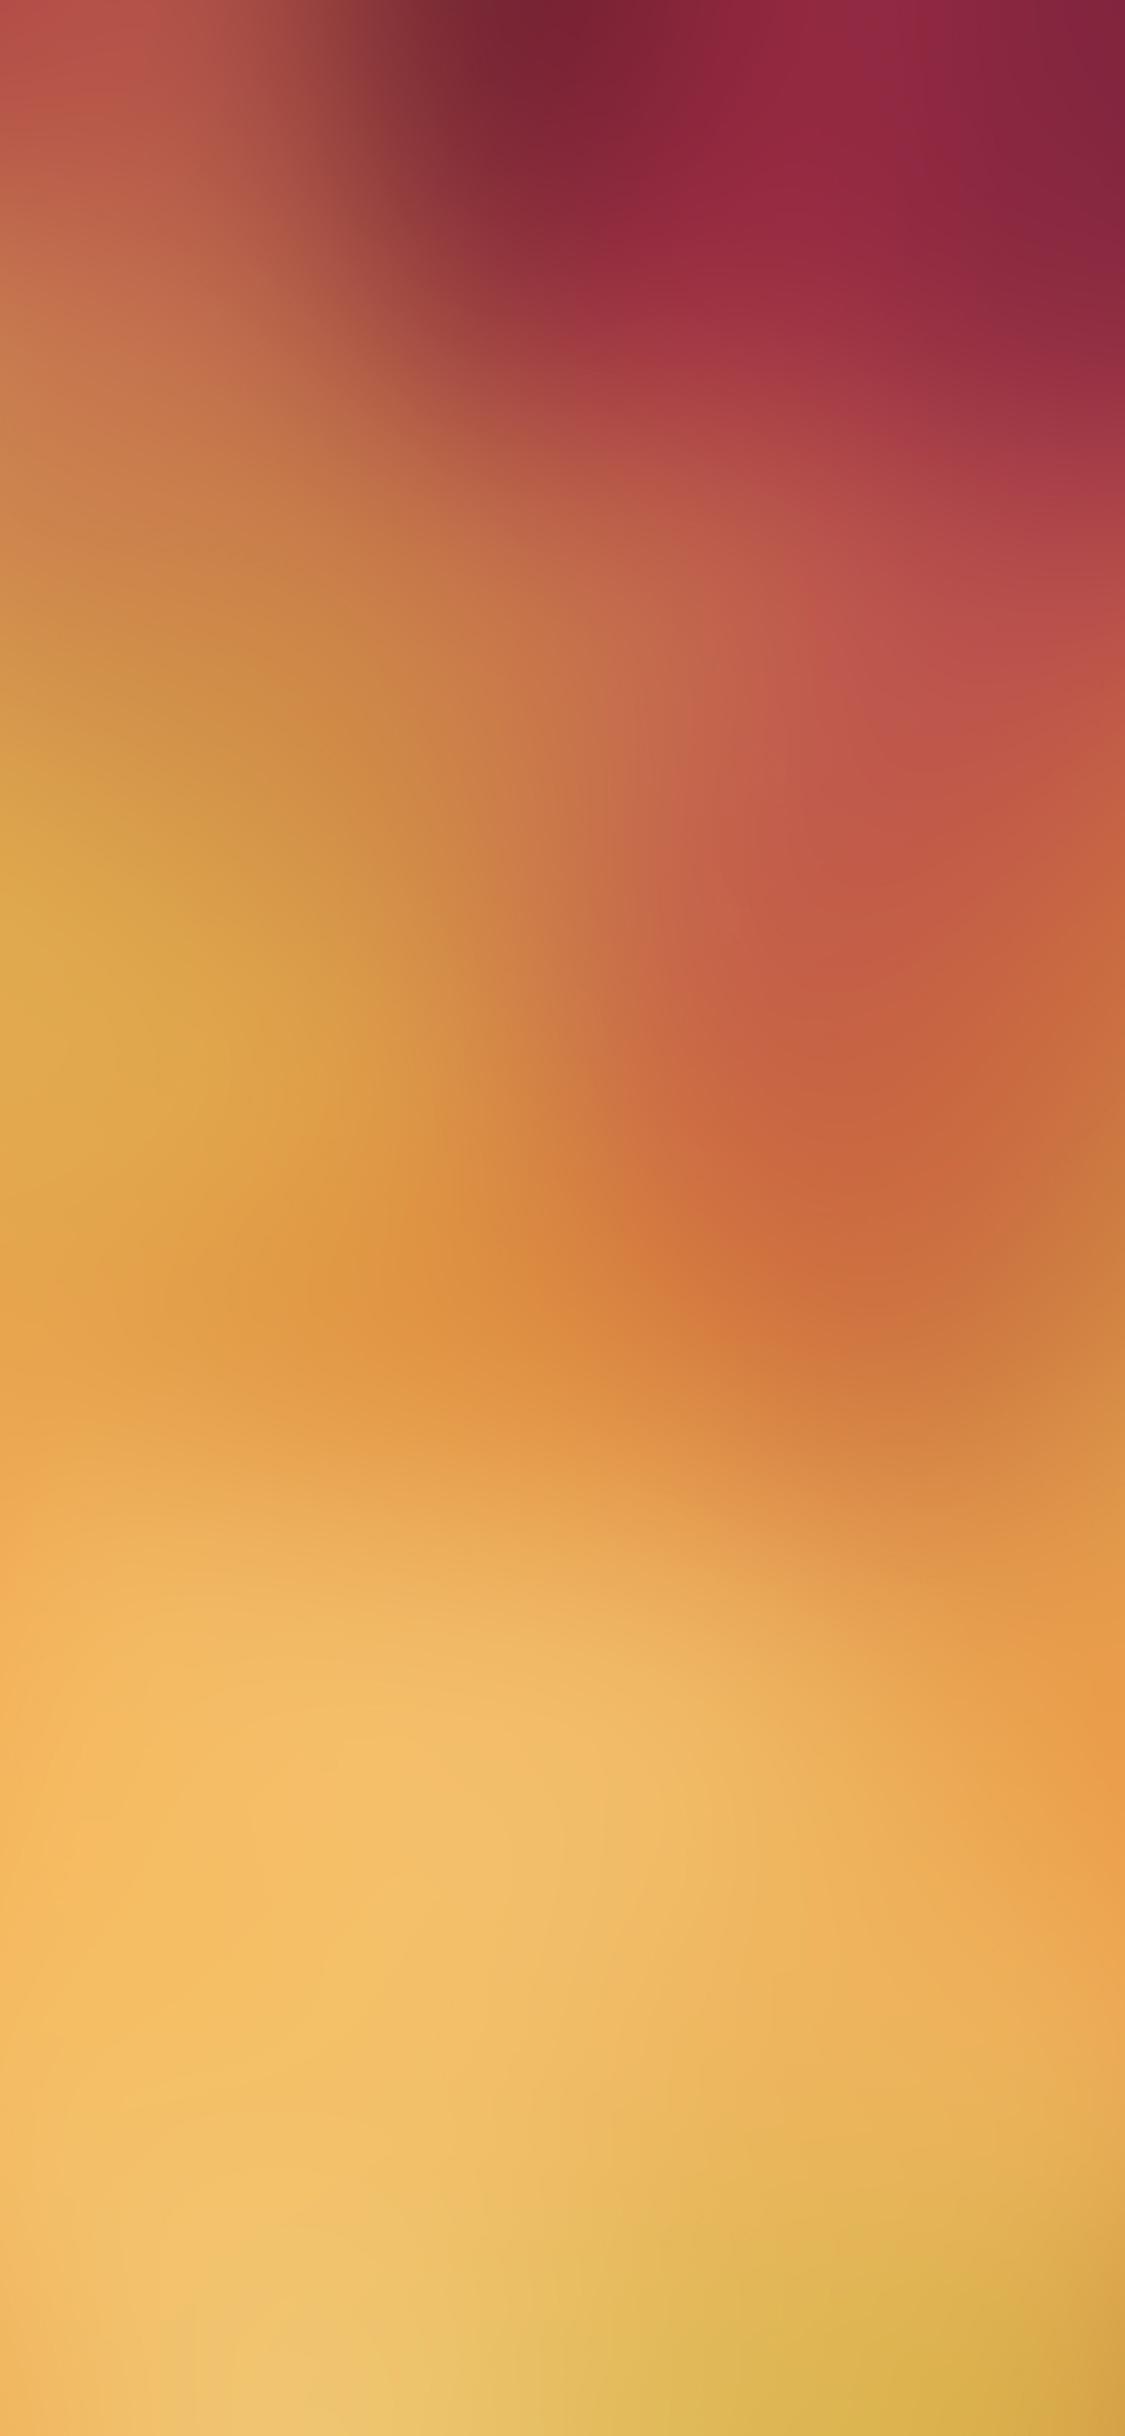 iPhoneXpapers.com-Apple-iPhone-wallpaper-sb64-wallpaper-blocks-of-orange-triangles-blur